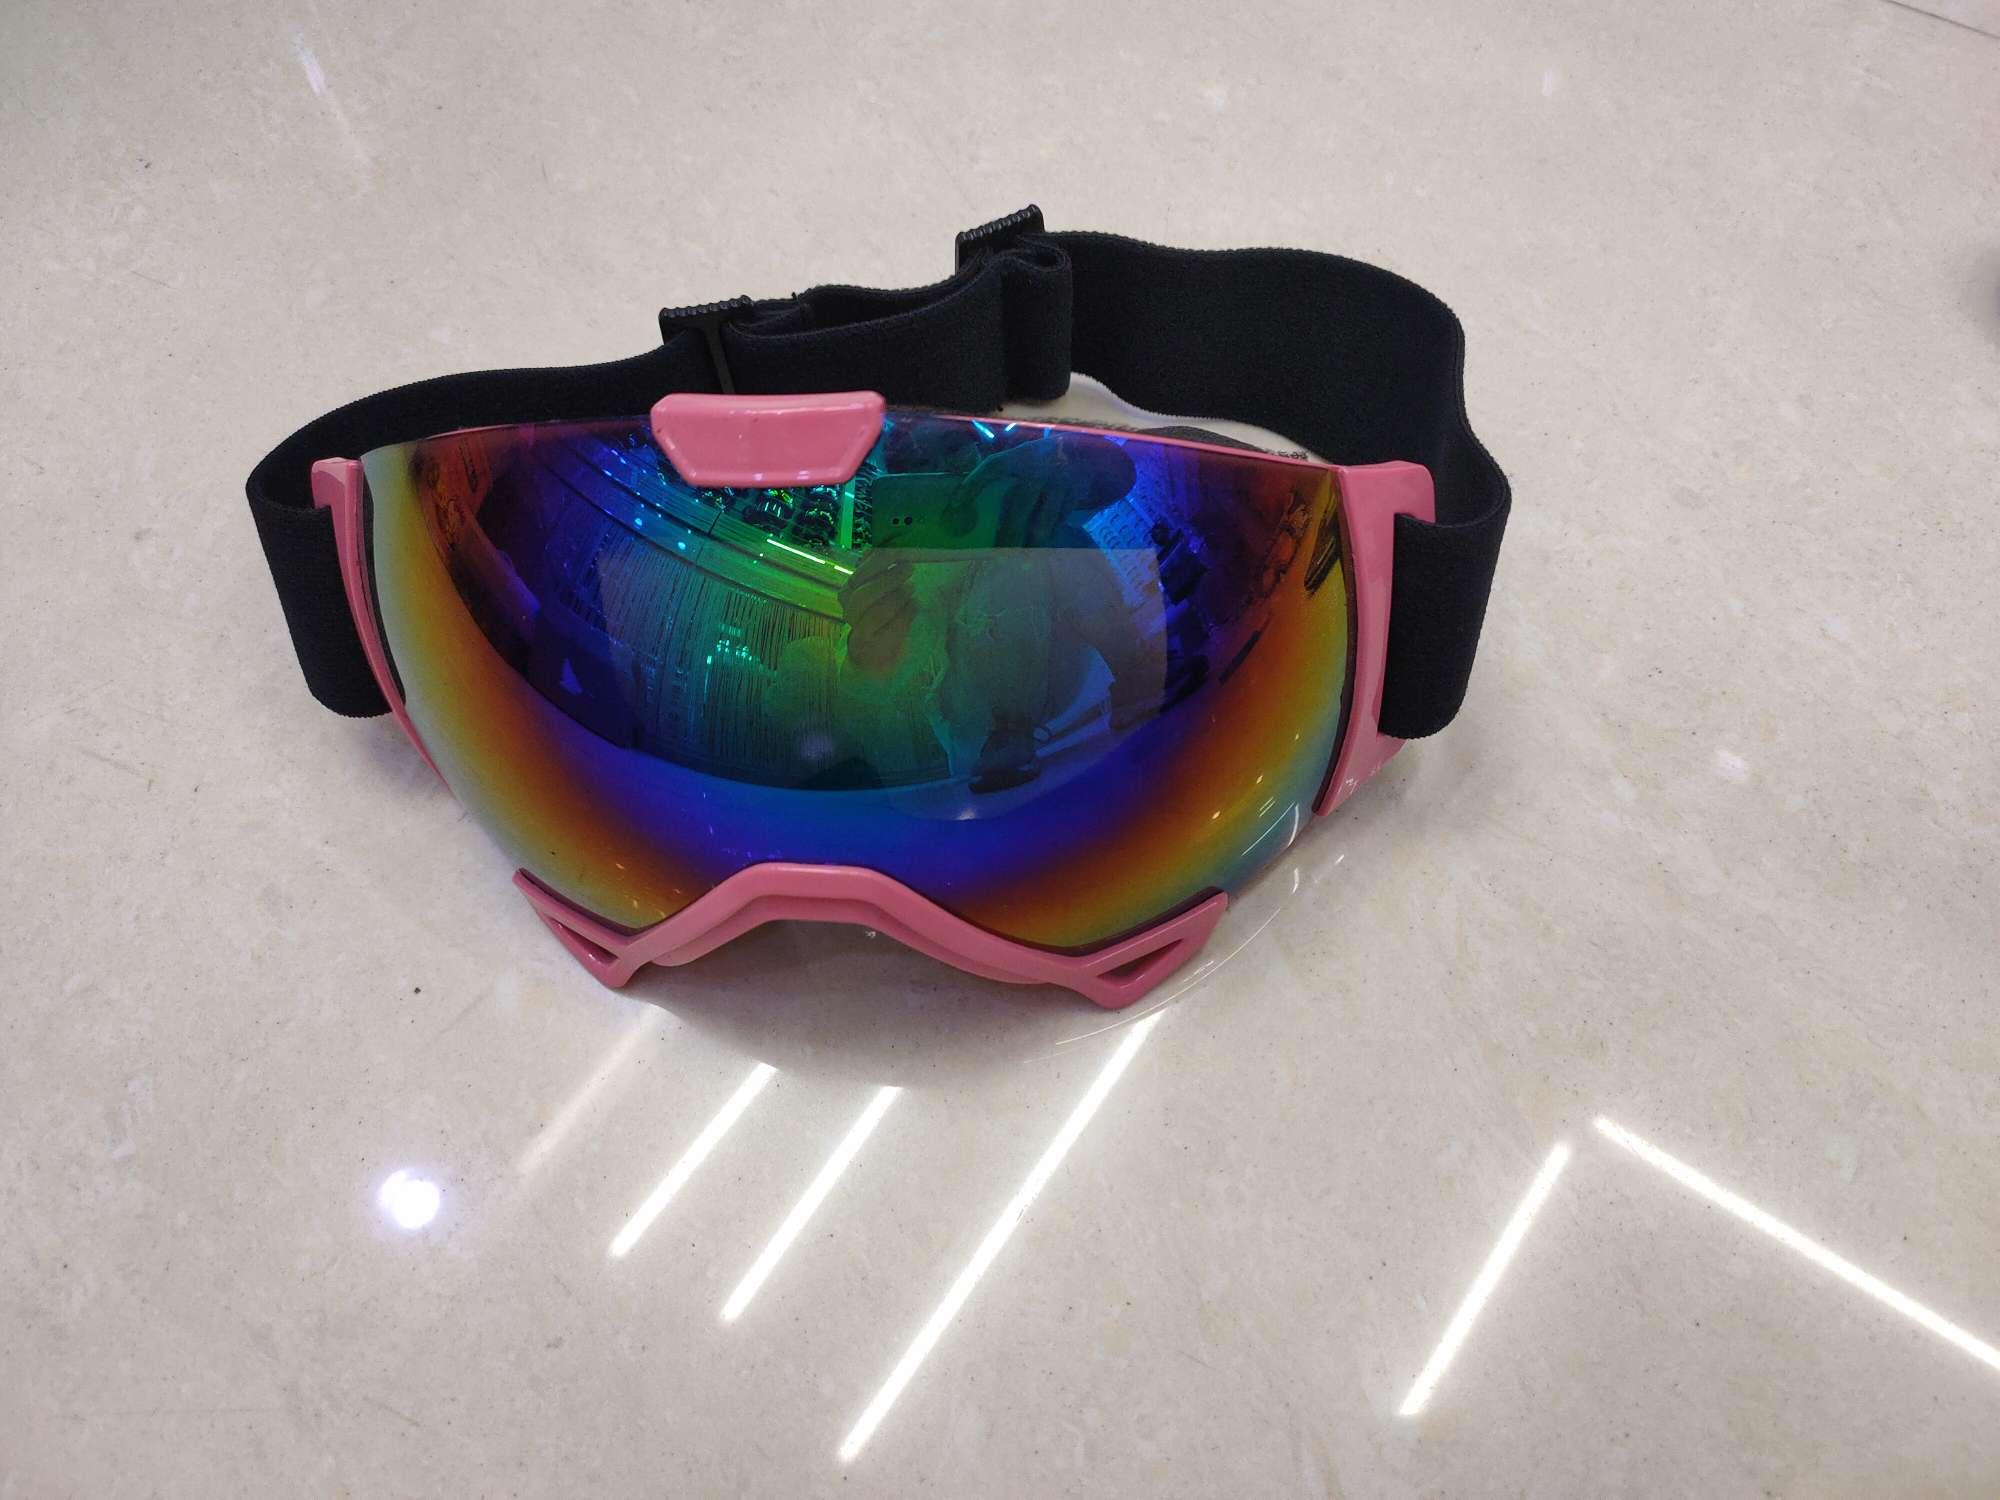 81662滑雪镜